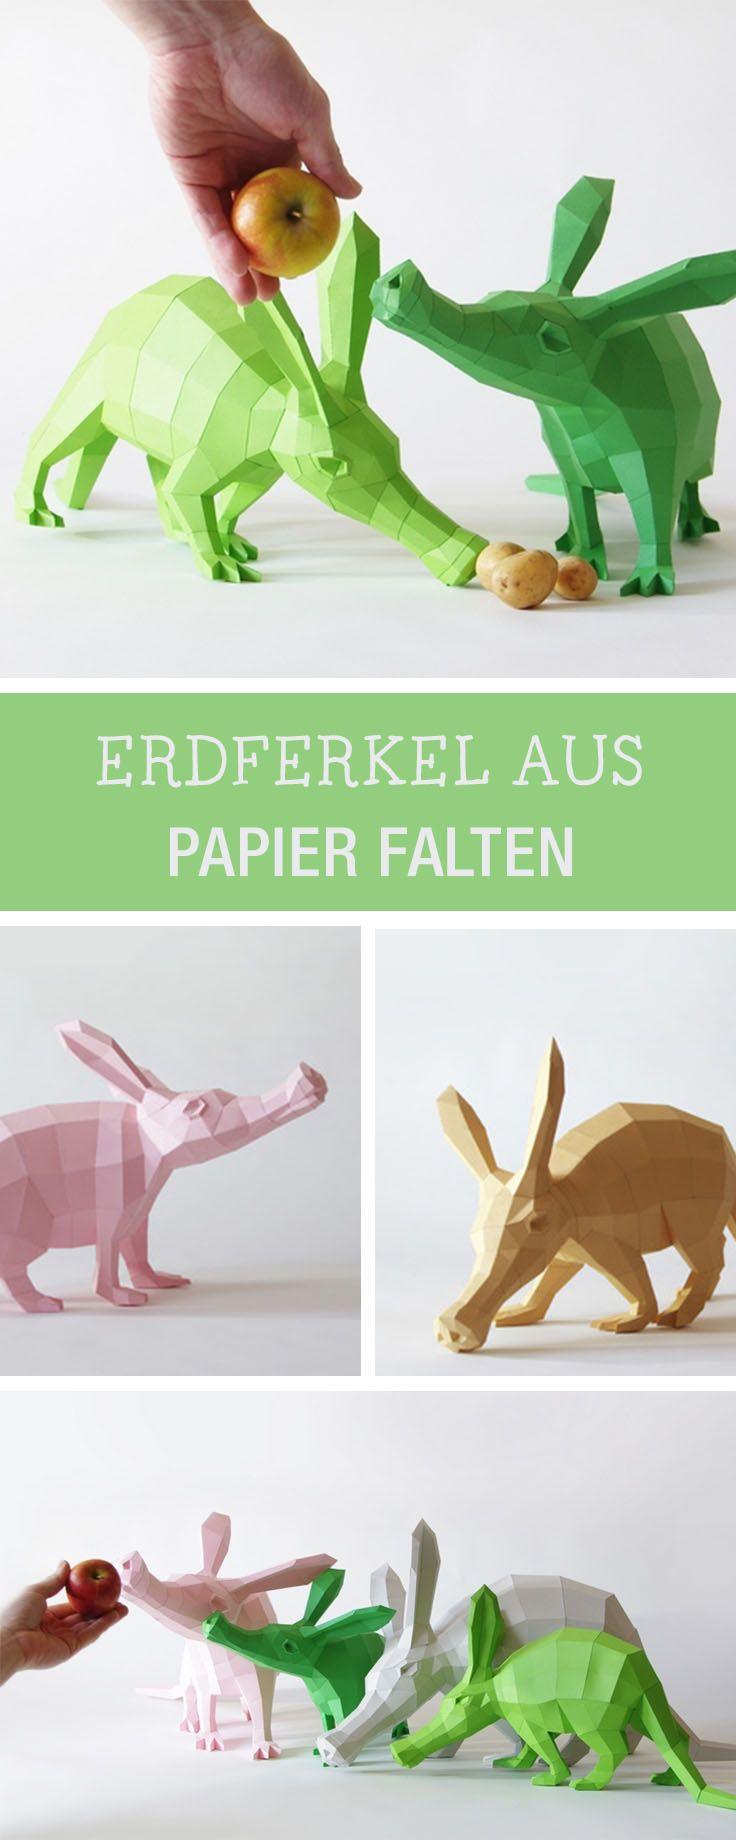 Witzige Erdferkel aus Papier: Printable für die Origami-Tiere gibt's hier / diy tutorial: origami aardvark made of paper via DaWanda.com (Cool Crafts Made)